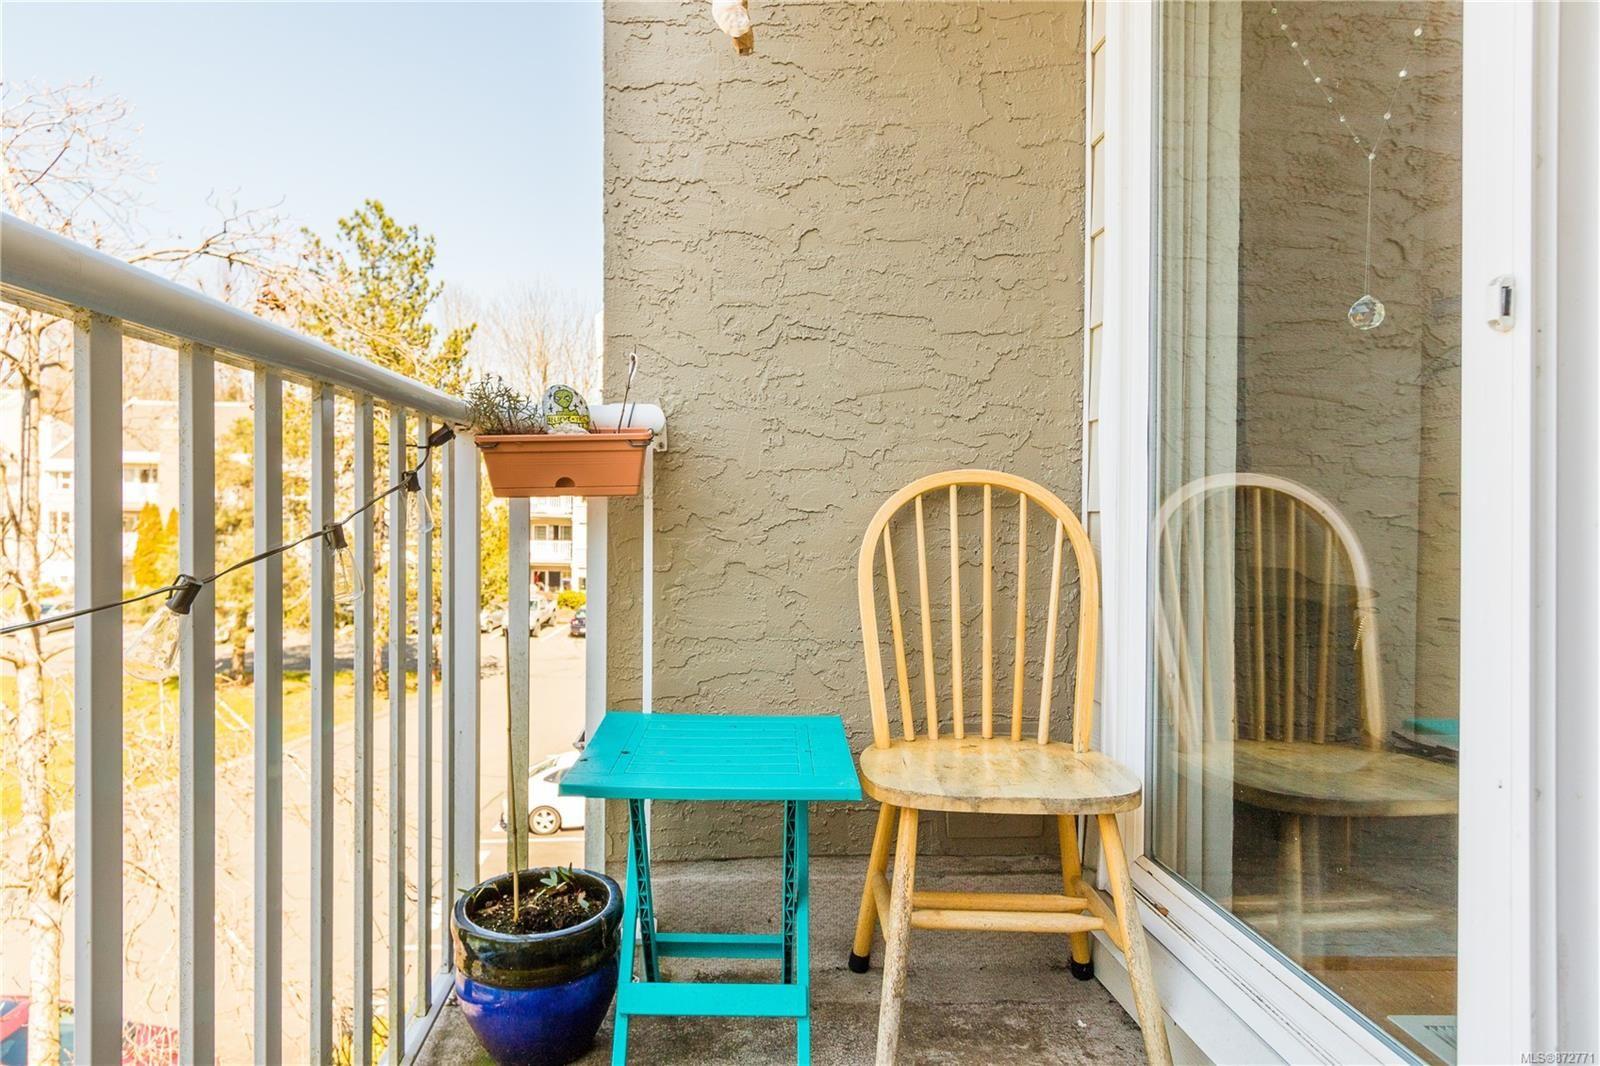 Photo 20: Photos: 305 205 1st St in : CV Courtenay City Condo for sale (Comox Valley)  : MLS®# 872771